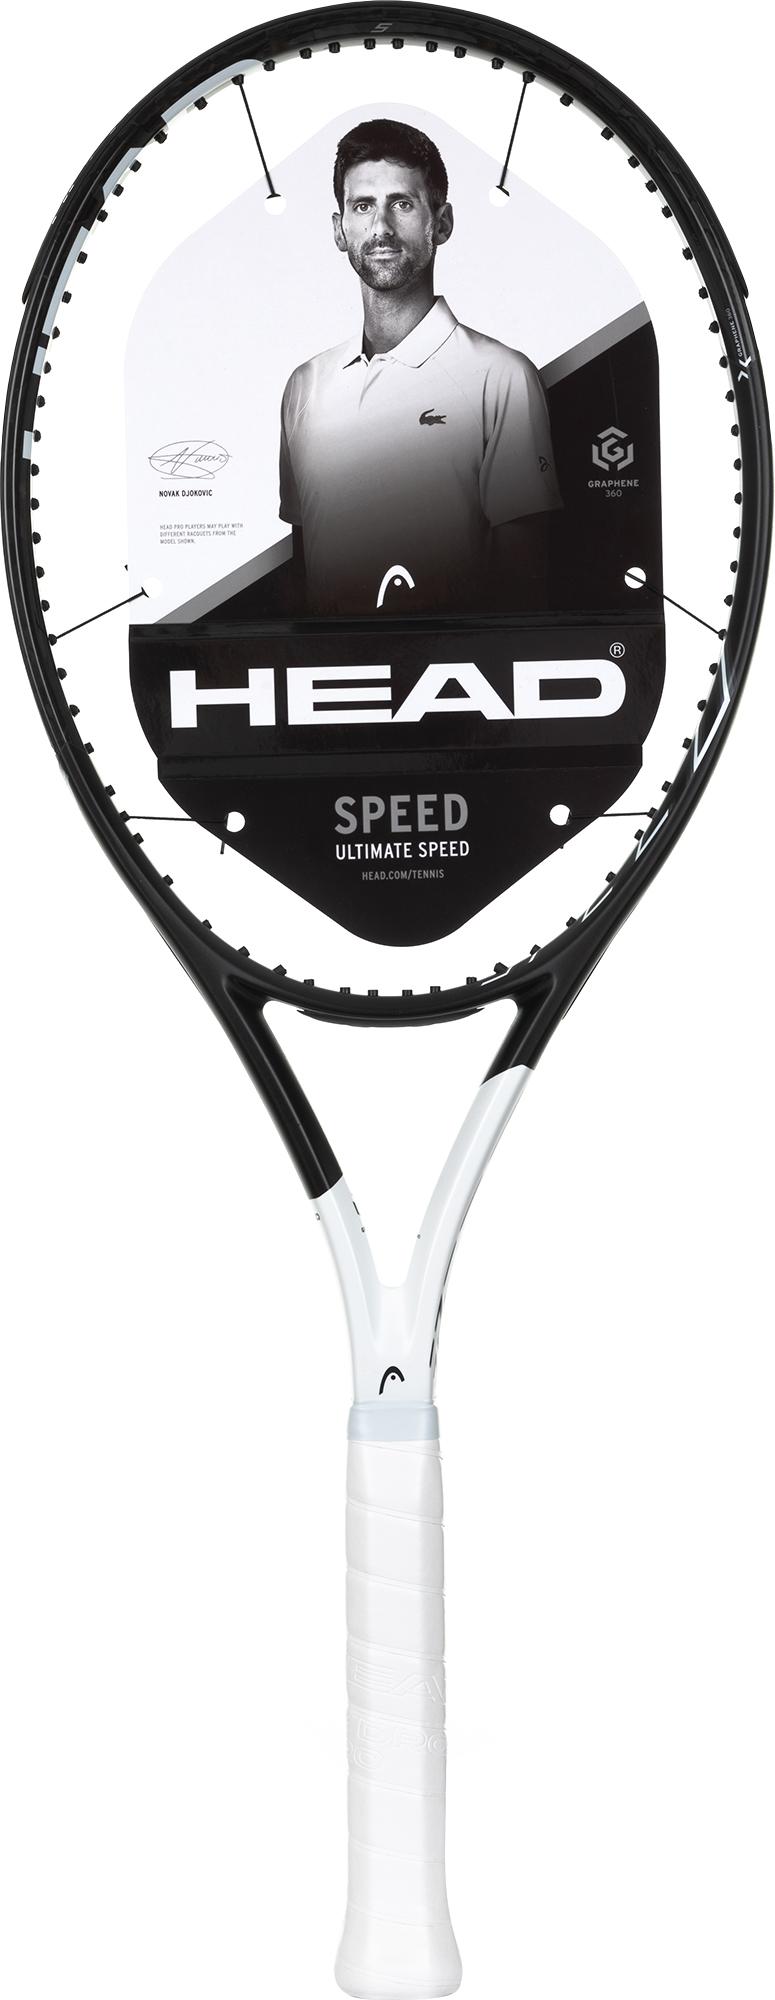 Head Ракетка для большого тенниса Head Graphene 360 Speed S head ракетка для большого тенниса head graphene 360 speed lite 27